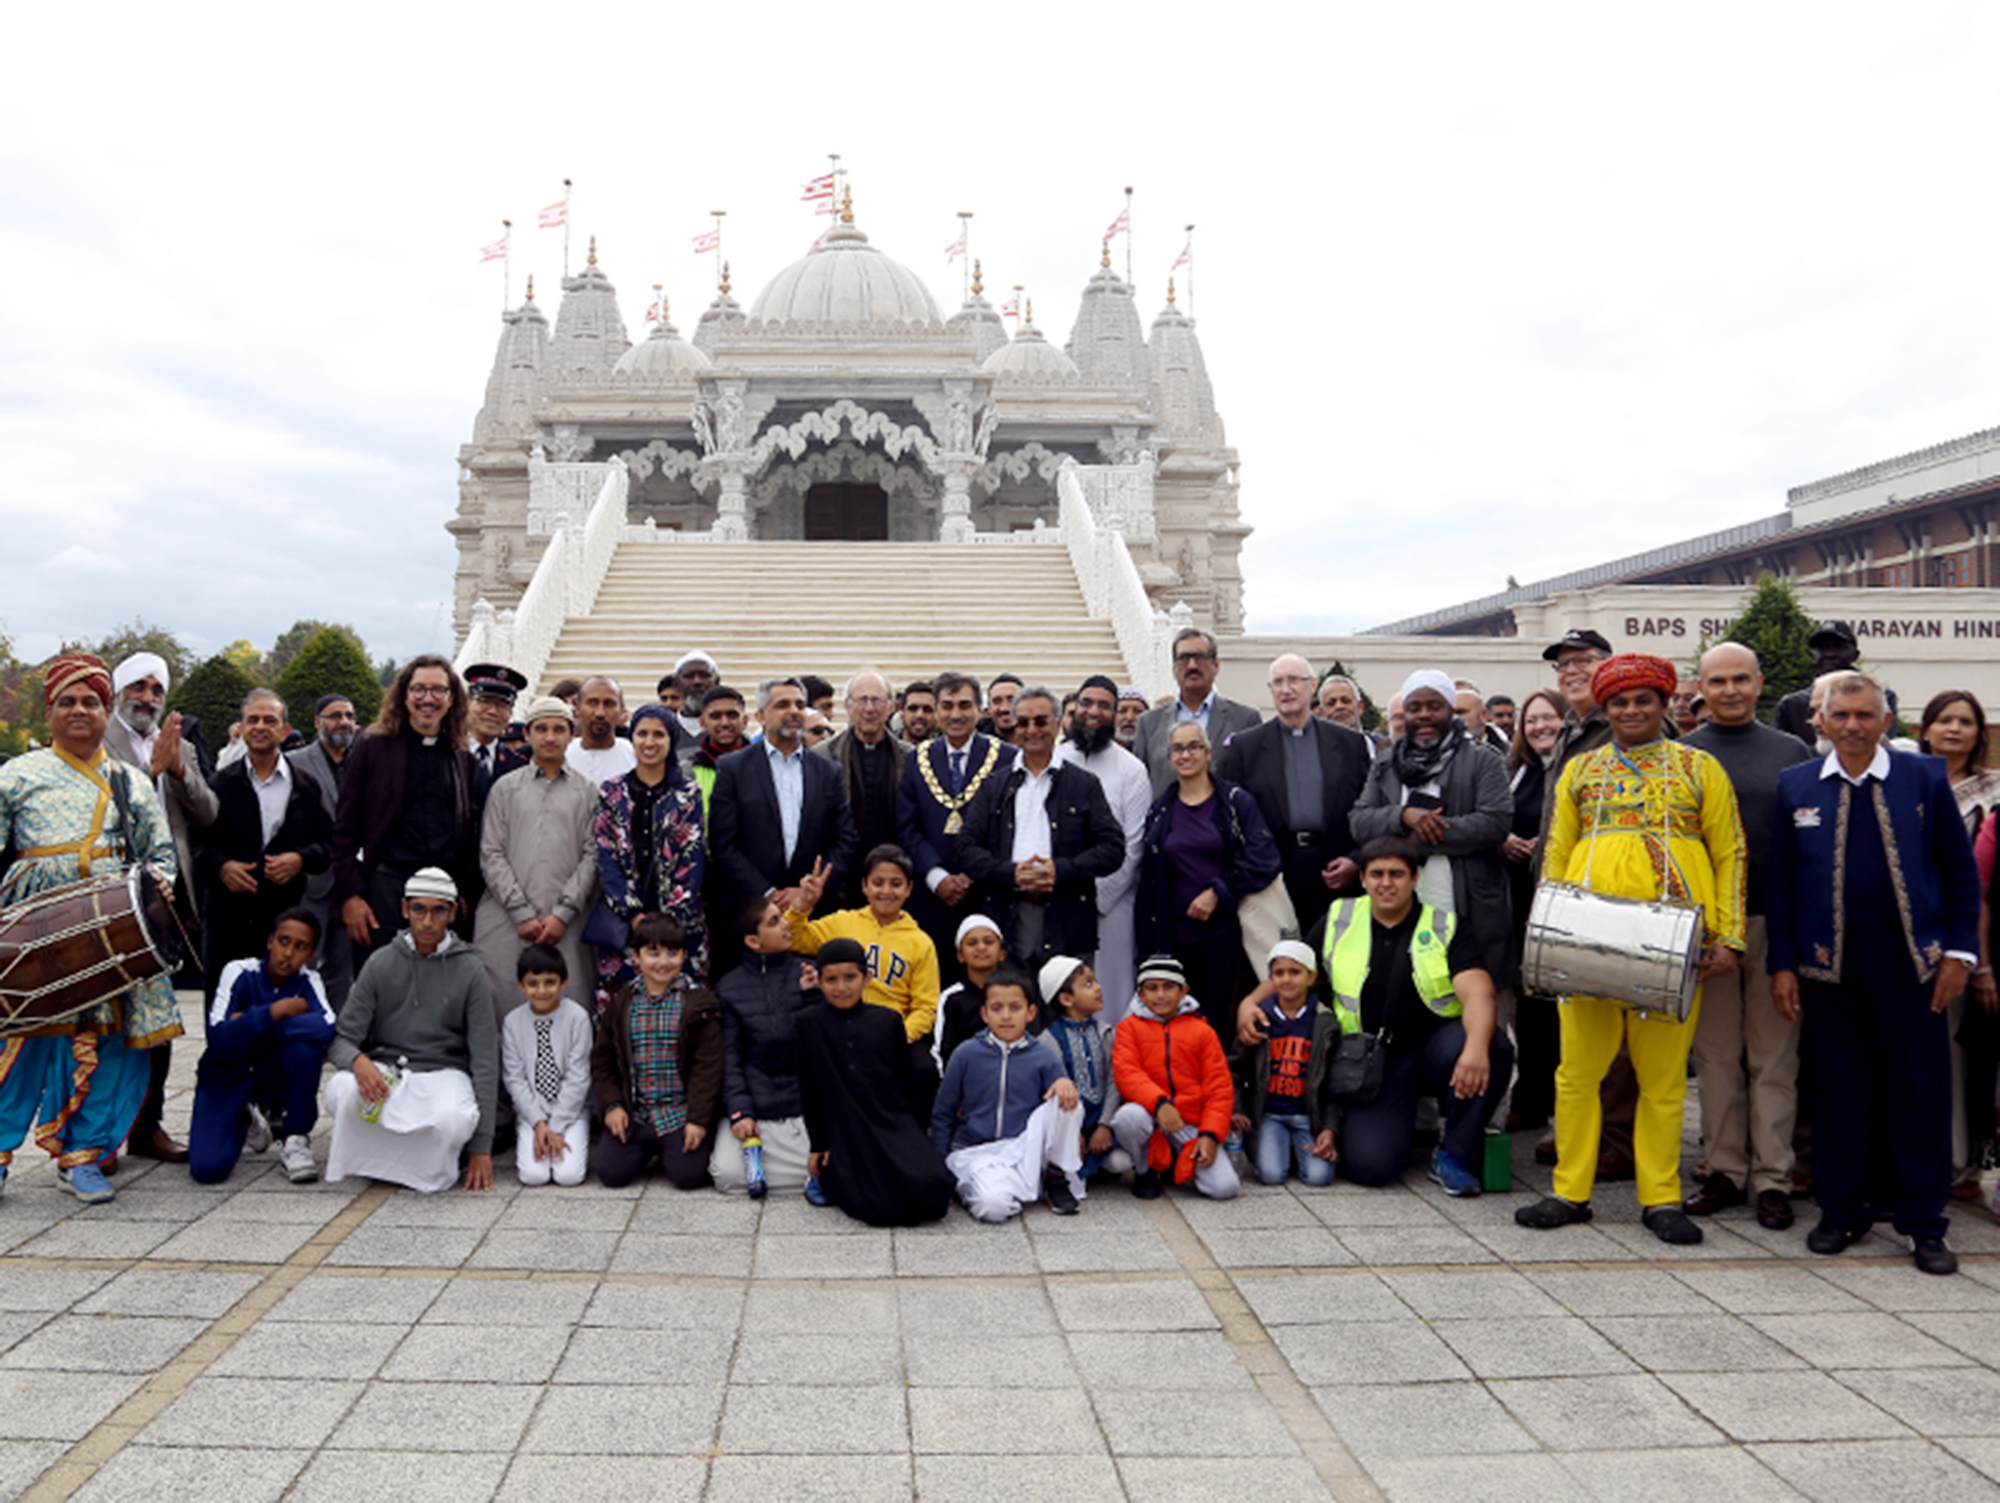 180930_london_interfaithpeacewalk (3)a